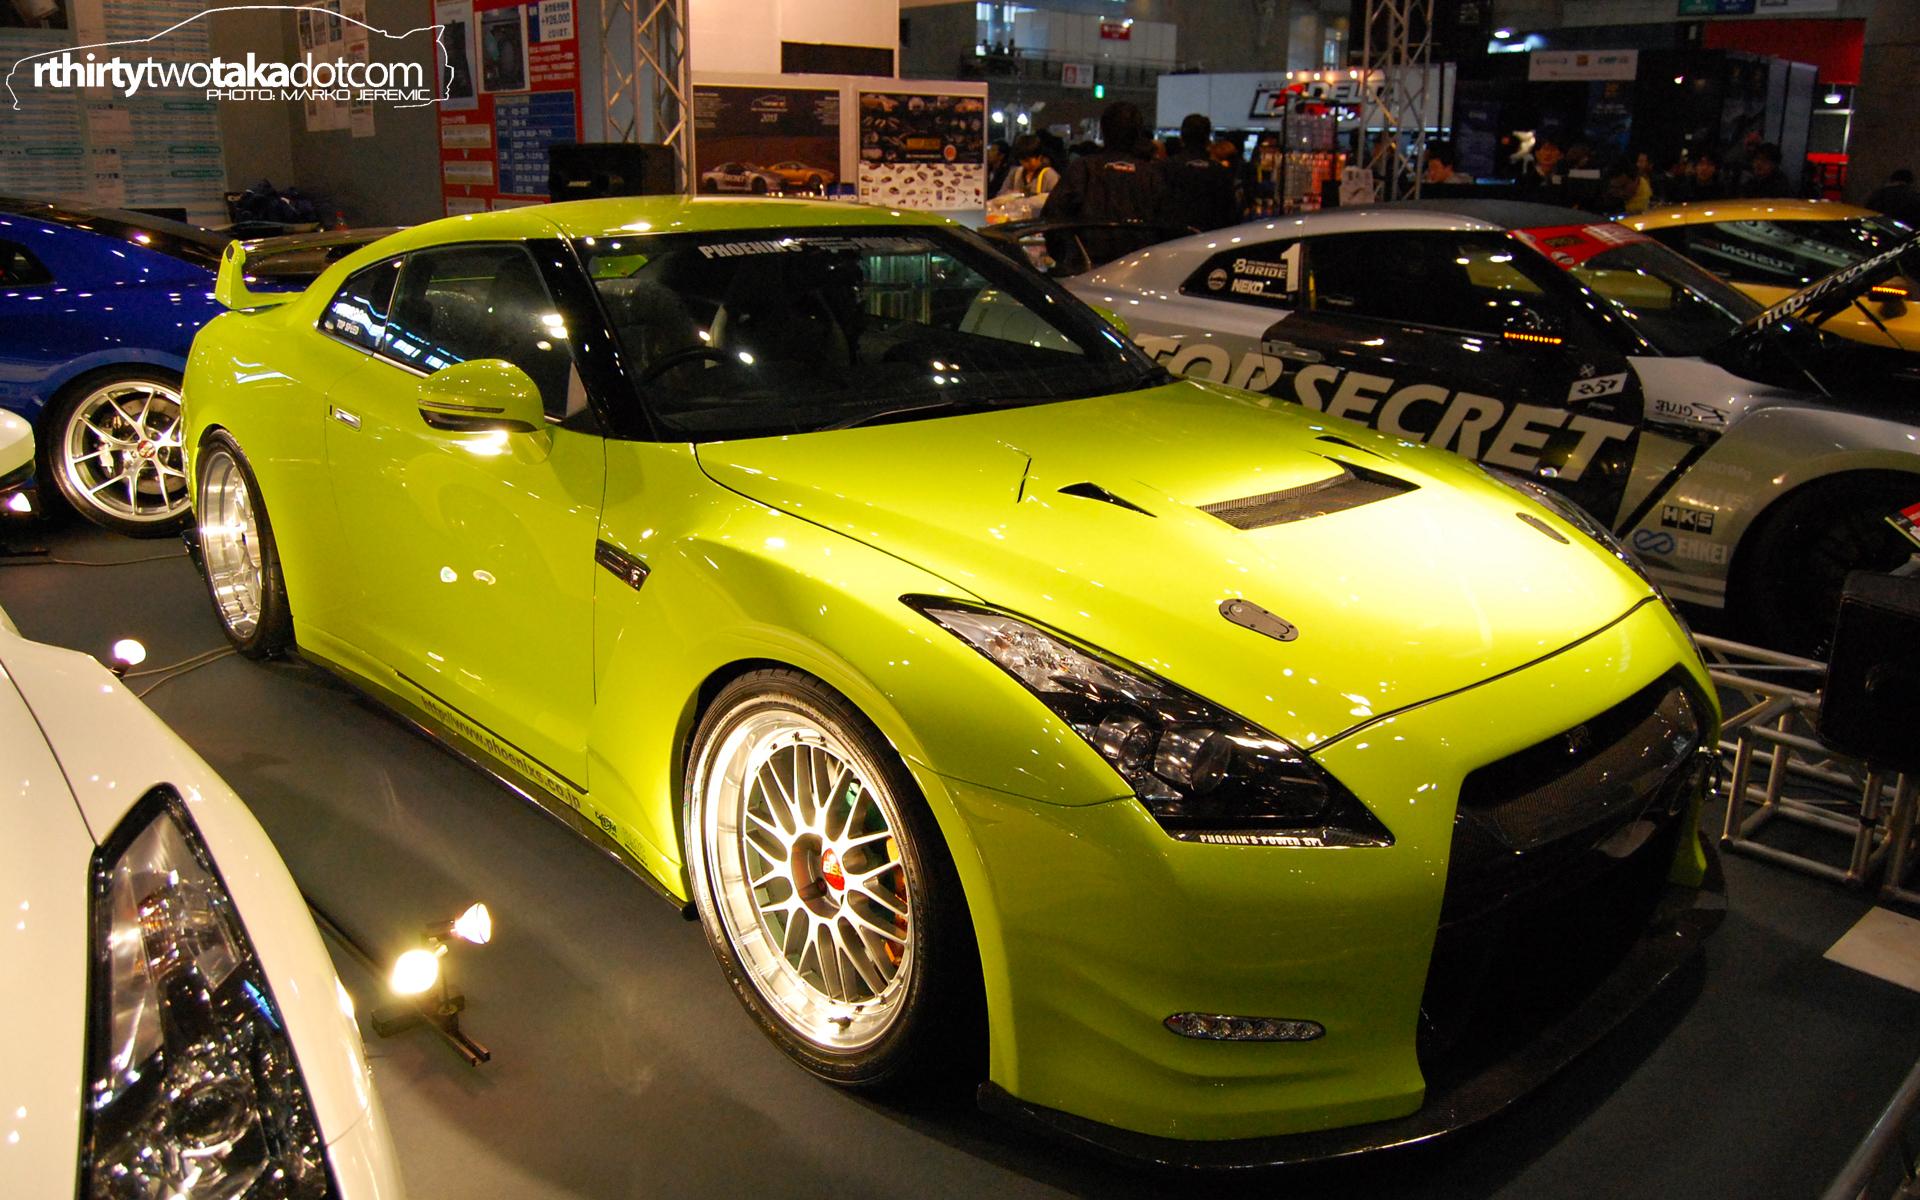 Tokyo auto salon 2013 part iv r32taka com for 2013 tokyo auto salon